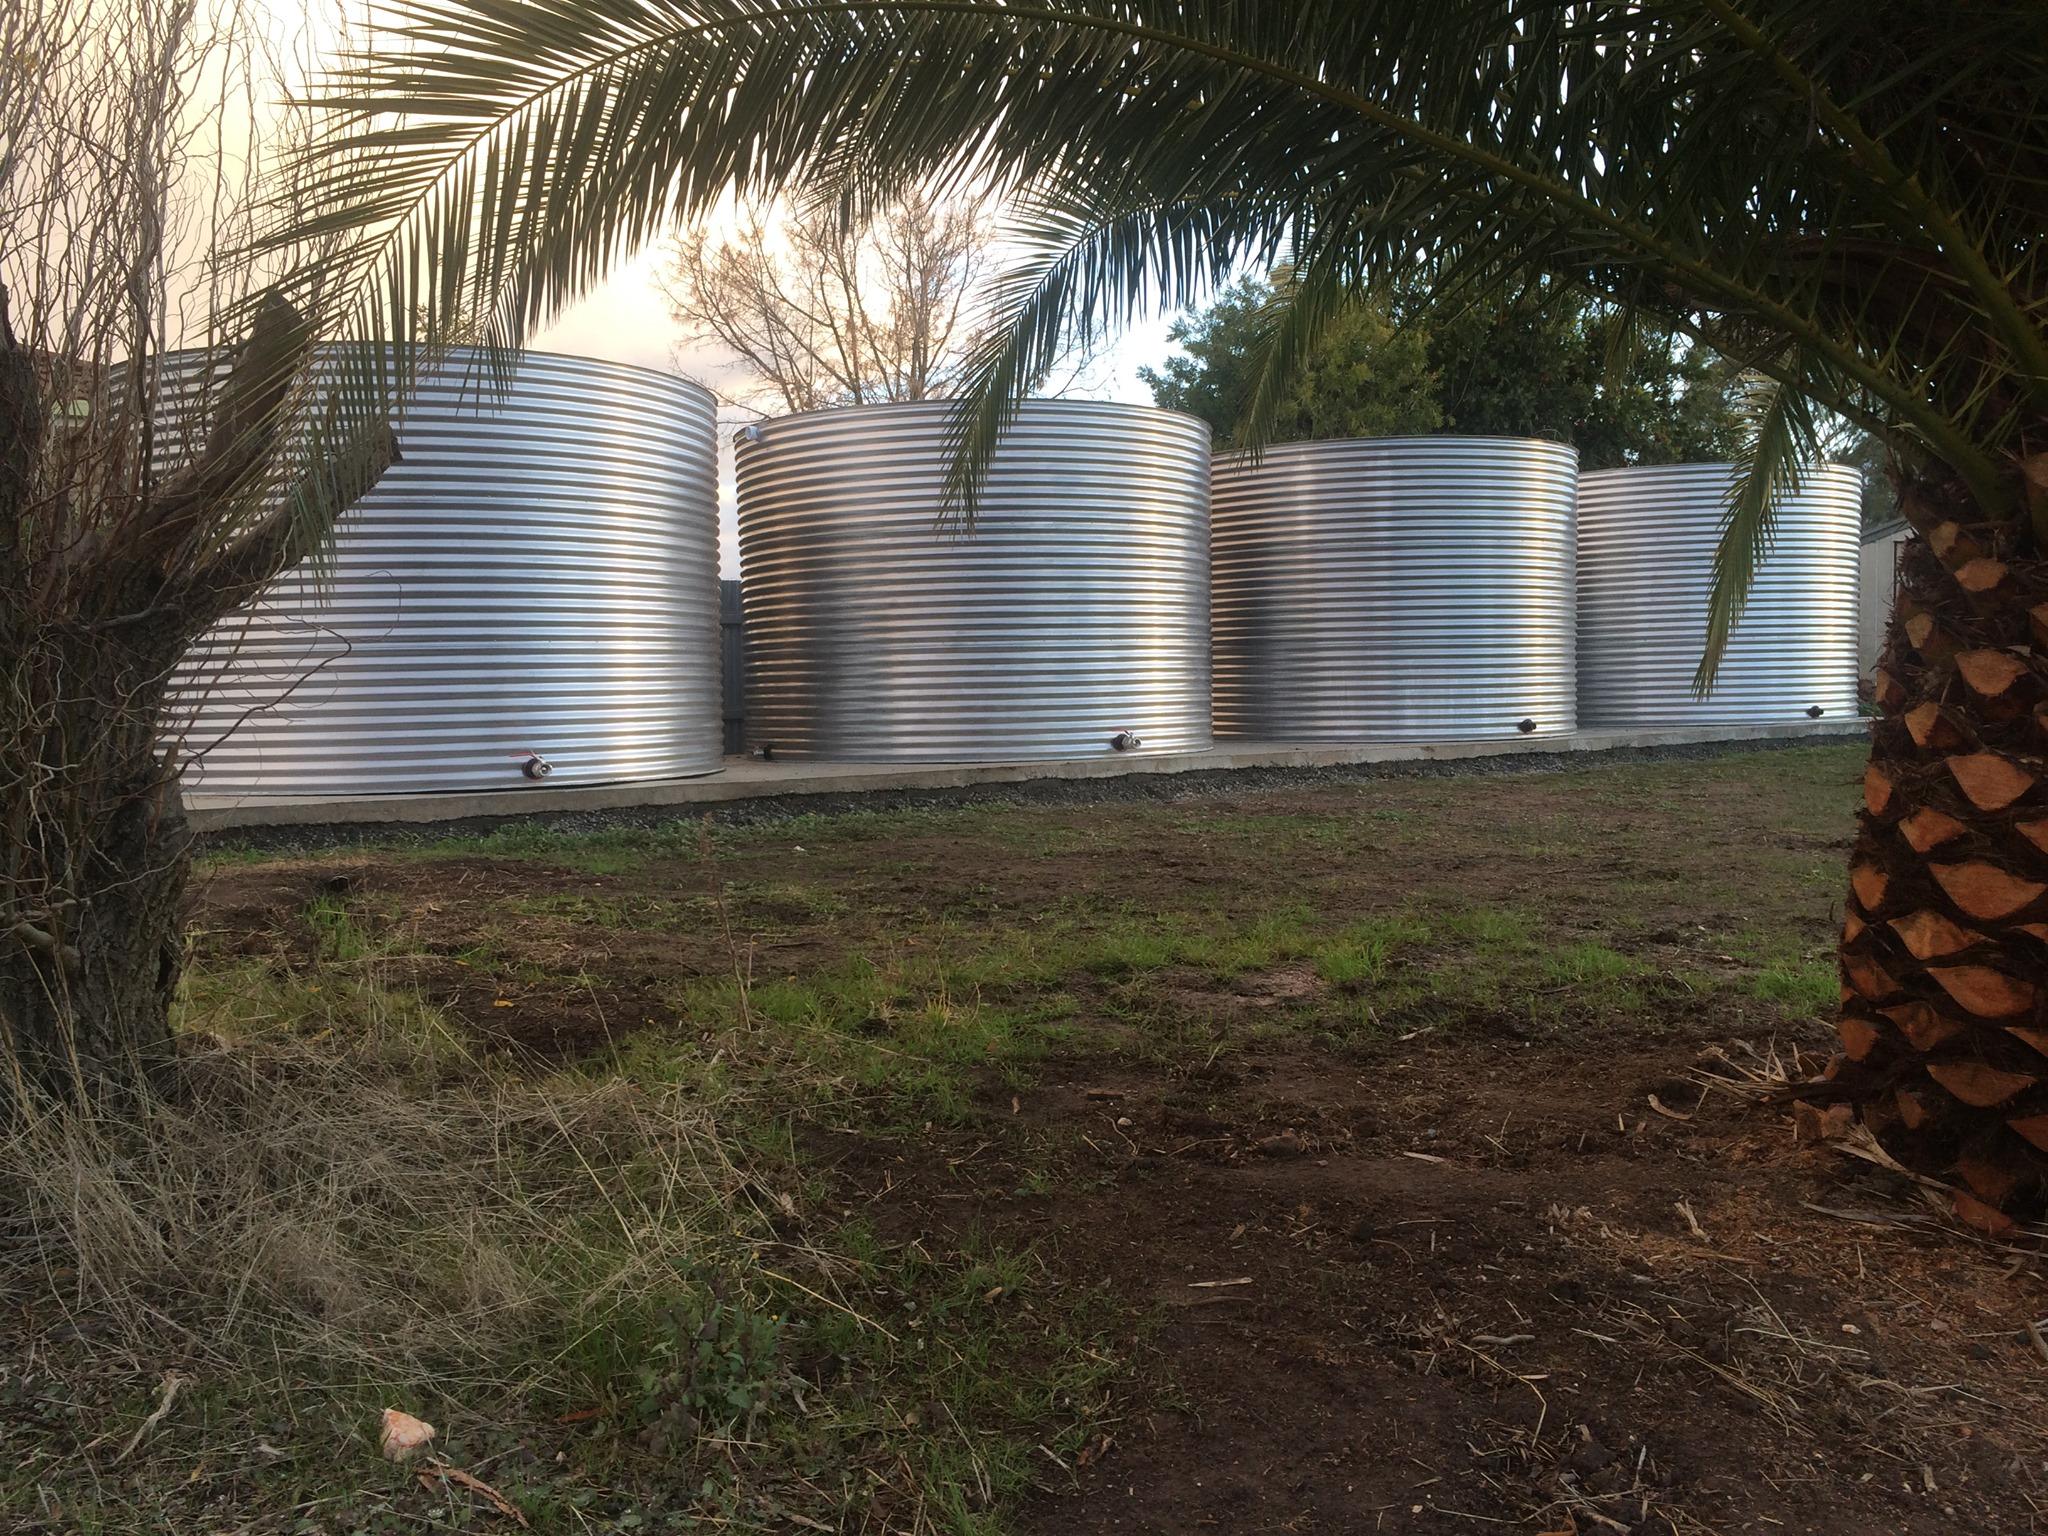 Stainless steel rainwater tanks